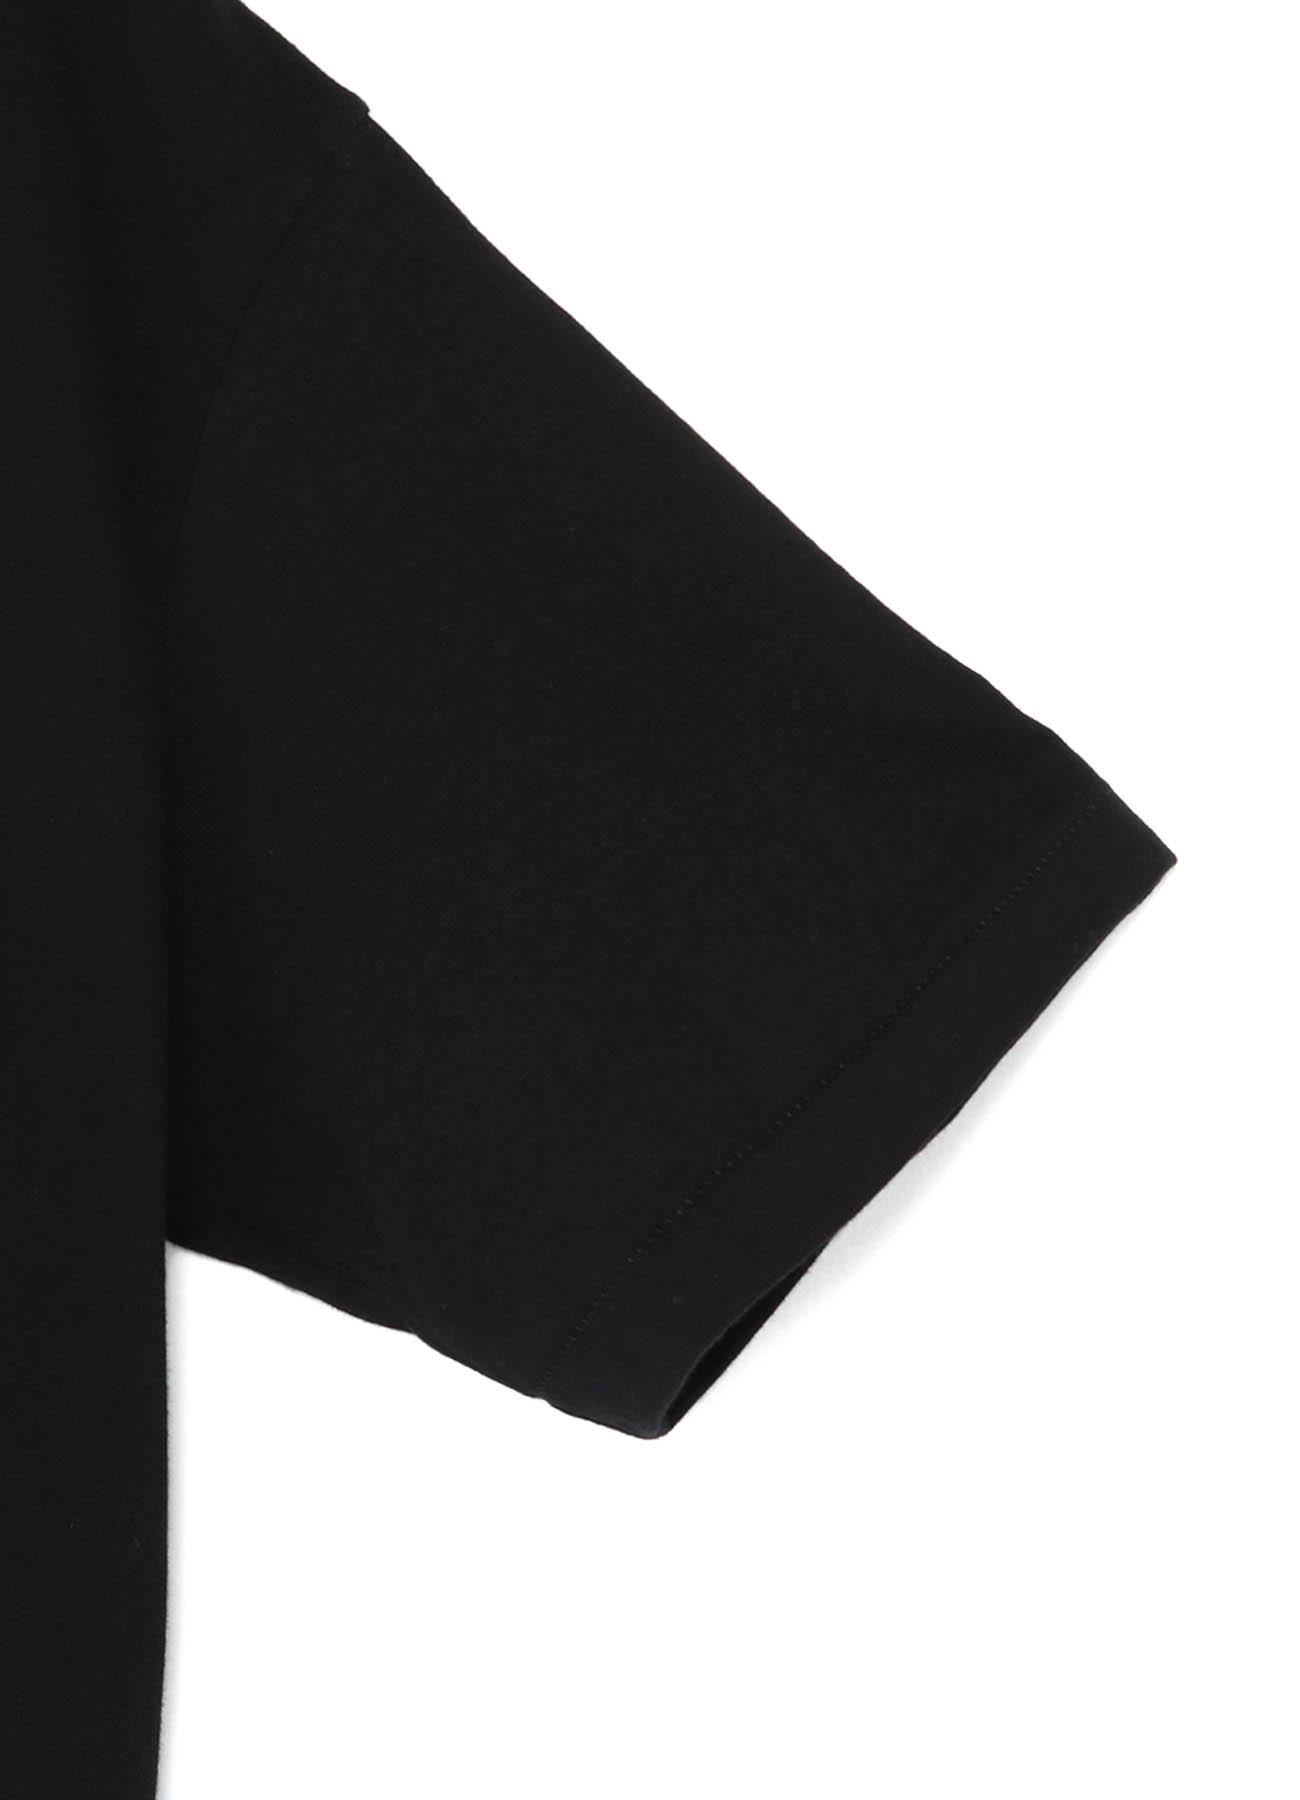 S'YTE × Fluence Collaboration T-shirt <LANDSCAPE>